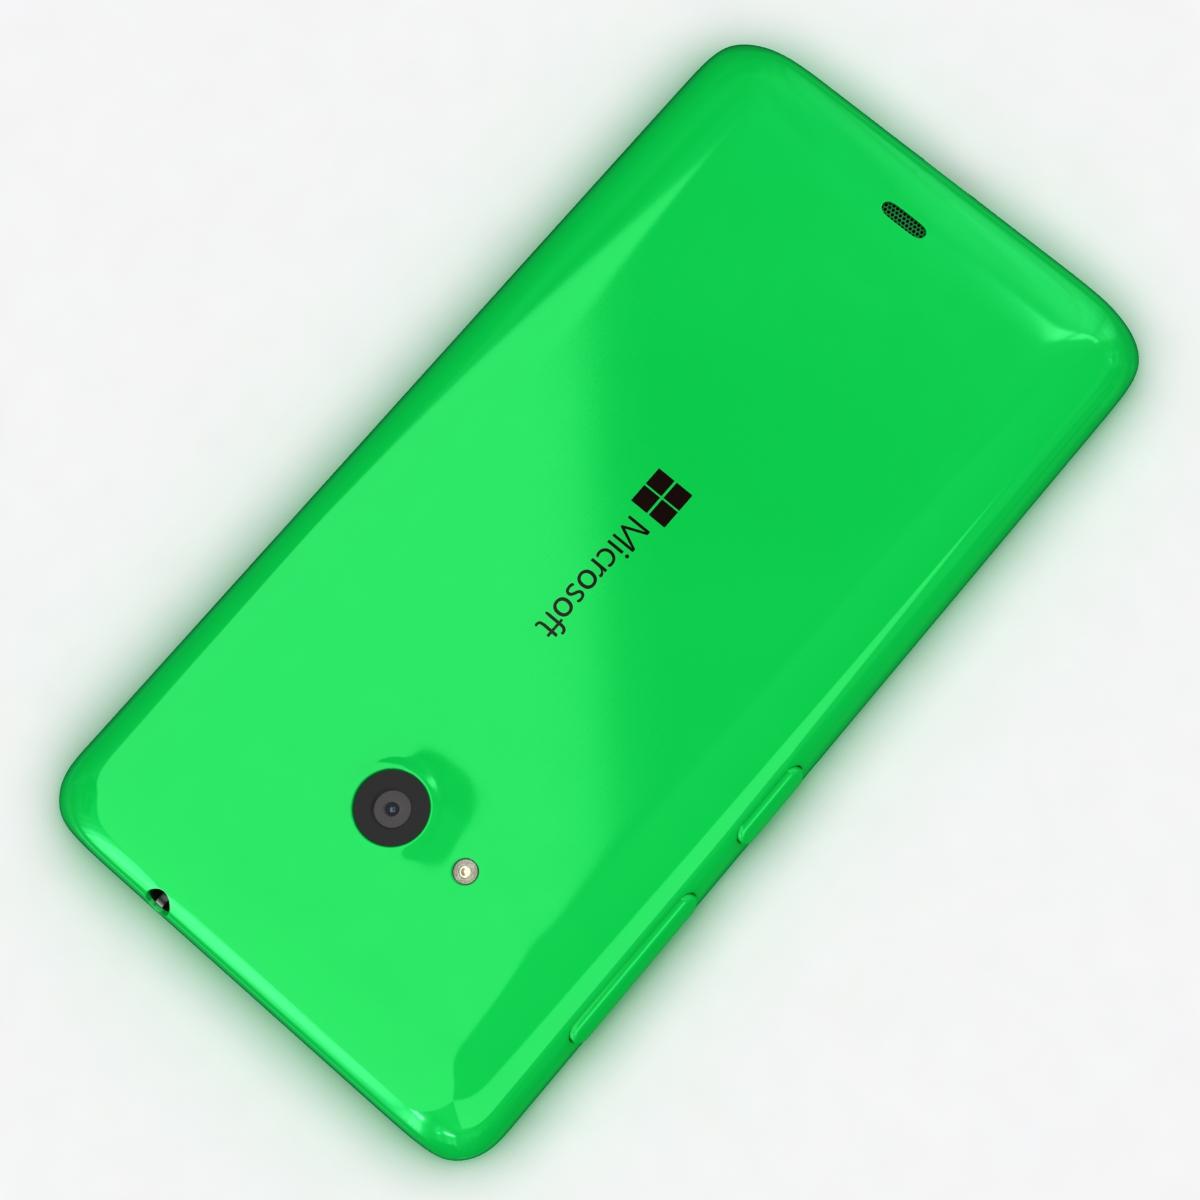 microsoft lumia 535 and dual sim green 3d model 3ds max fbx c4d obj 204173